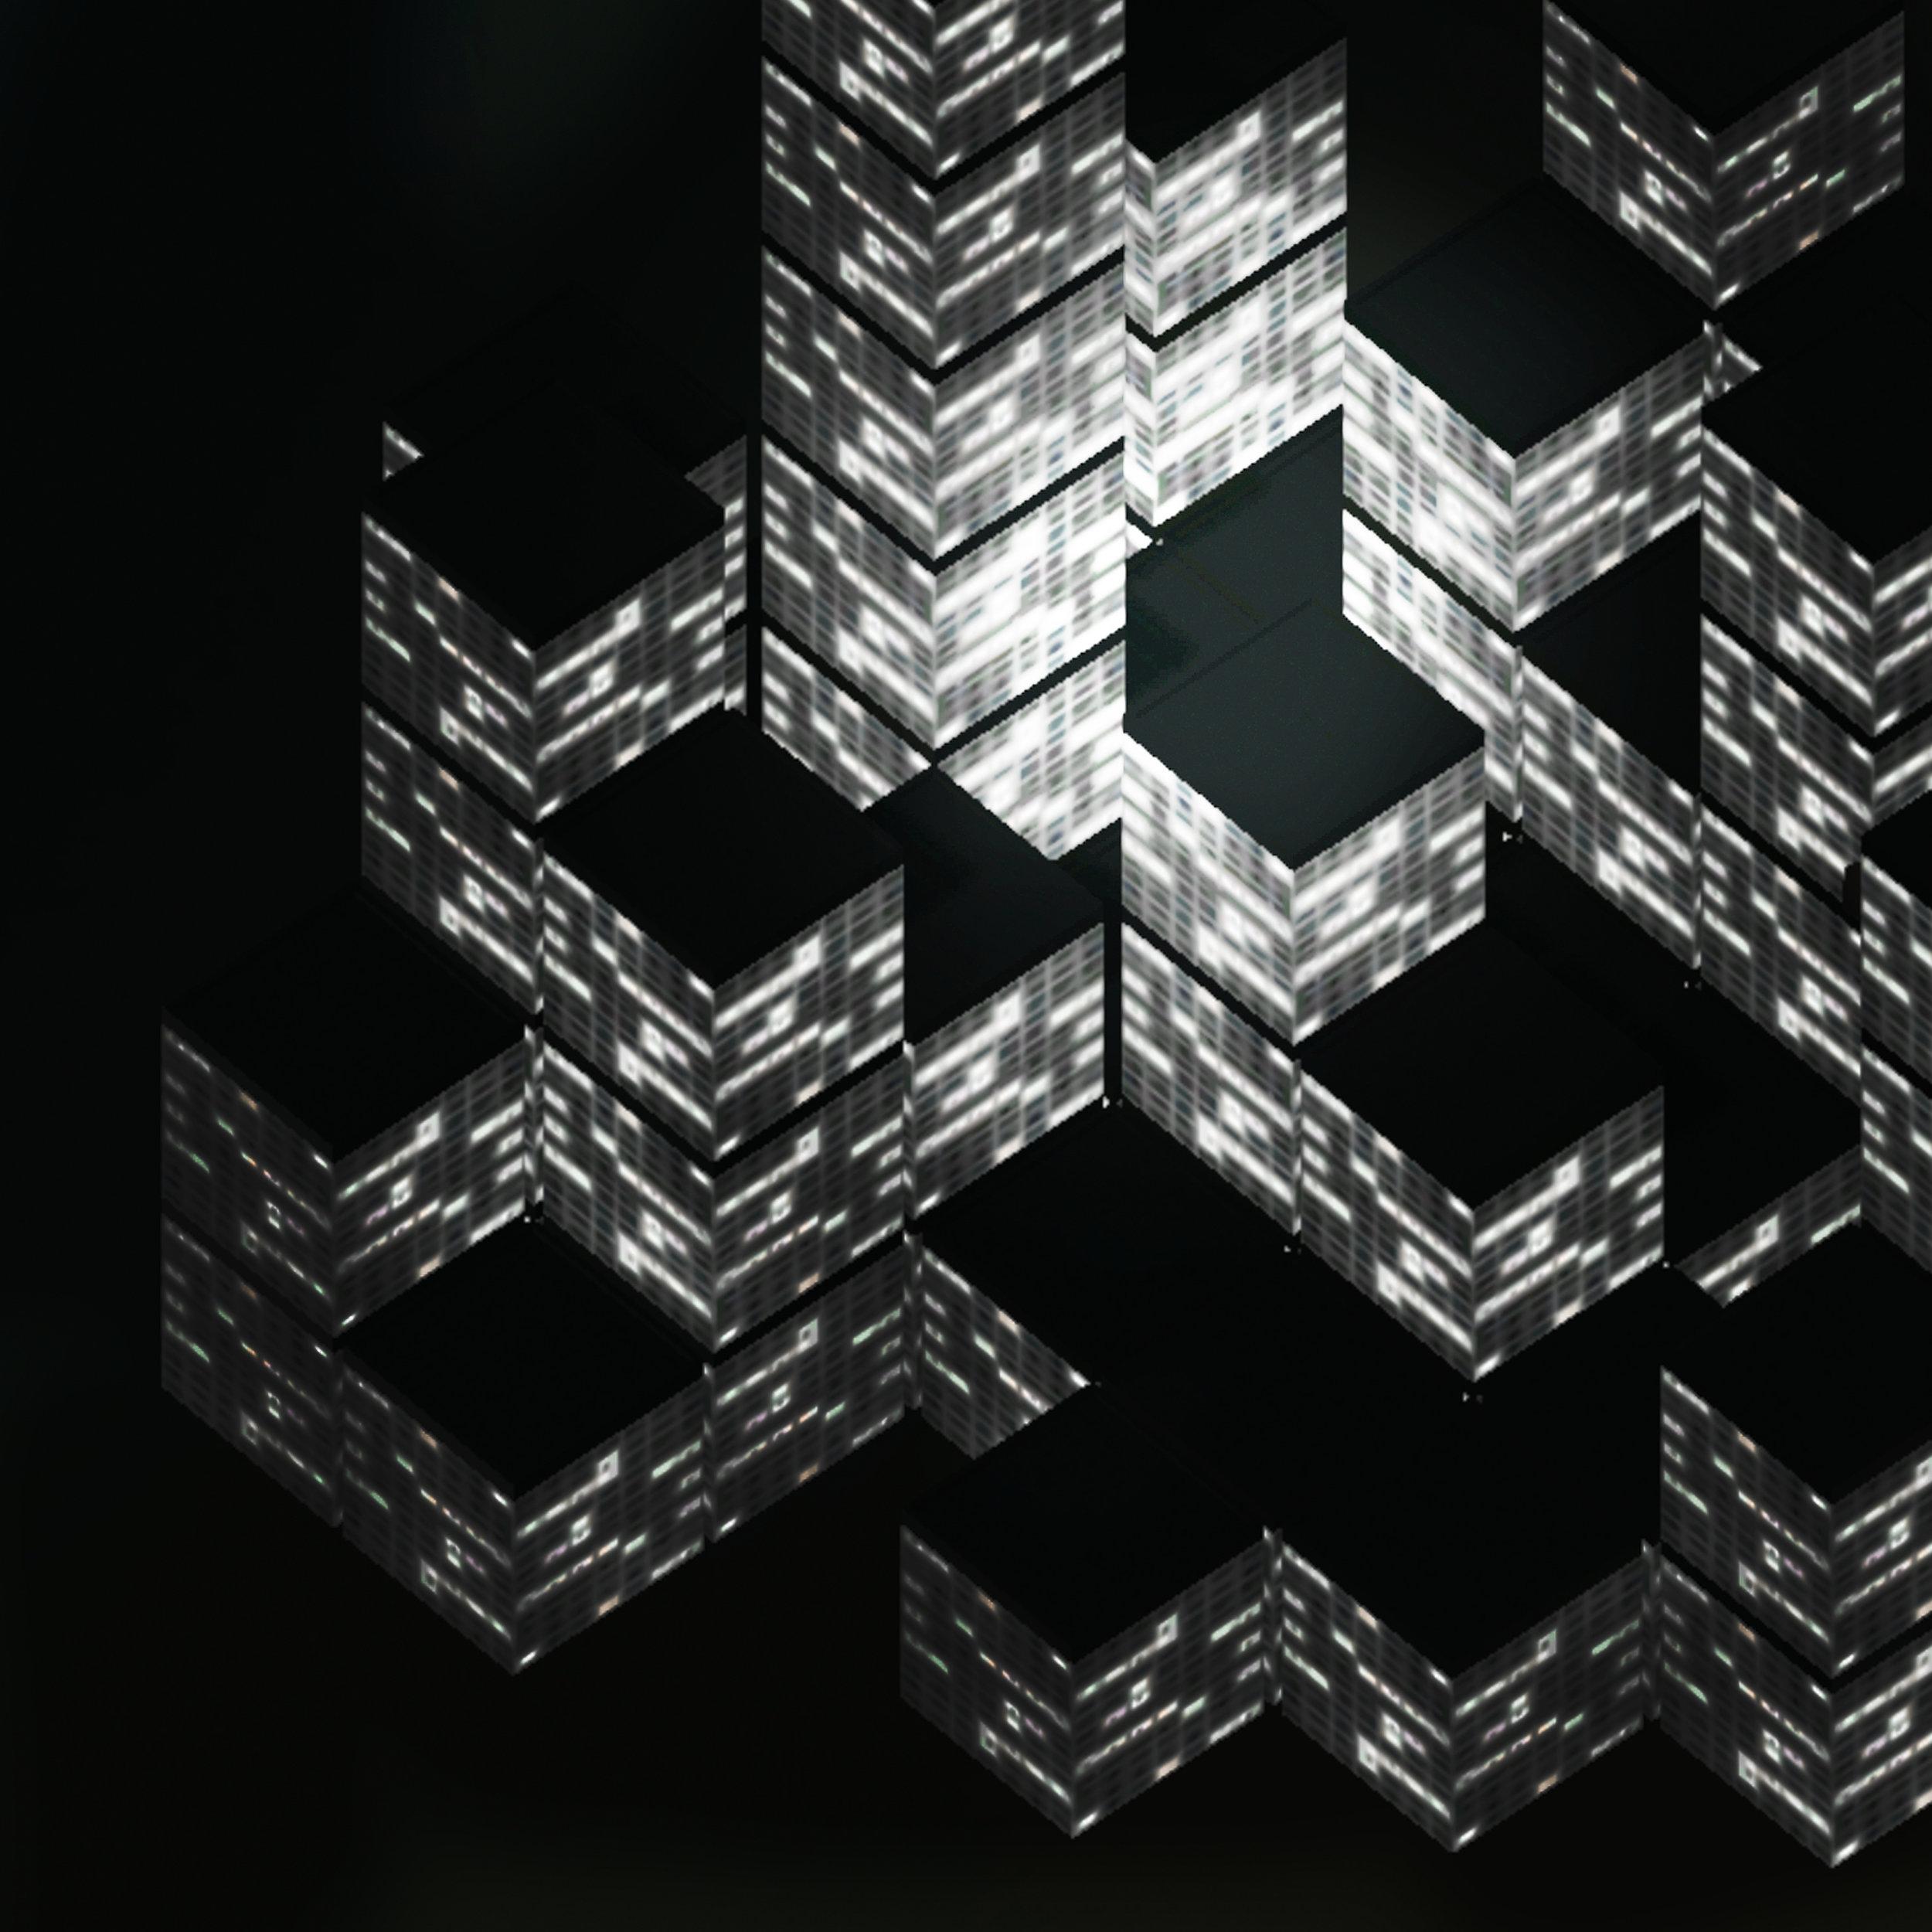 blacksquares.jpg